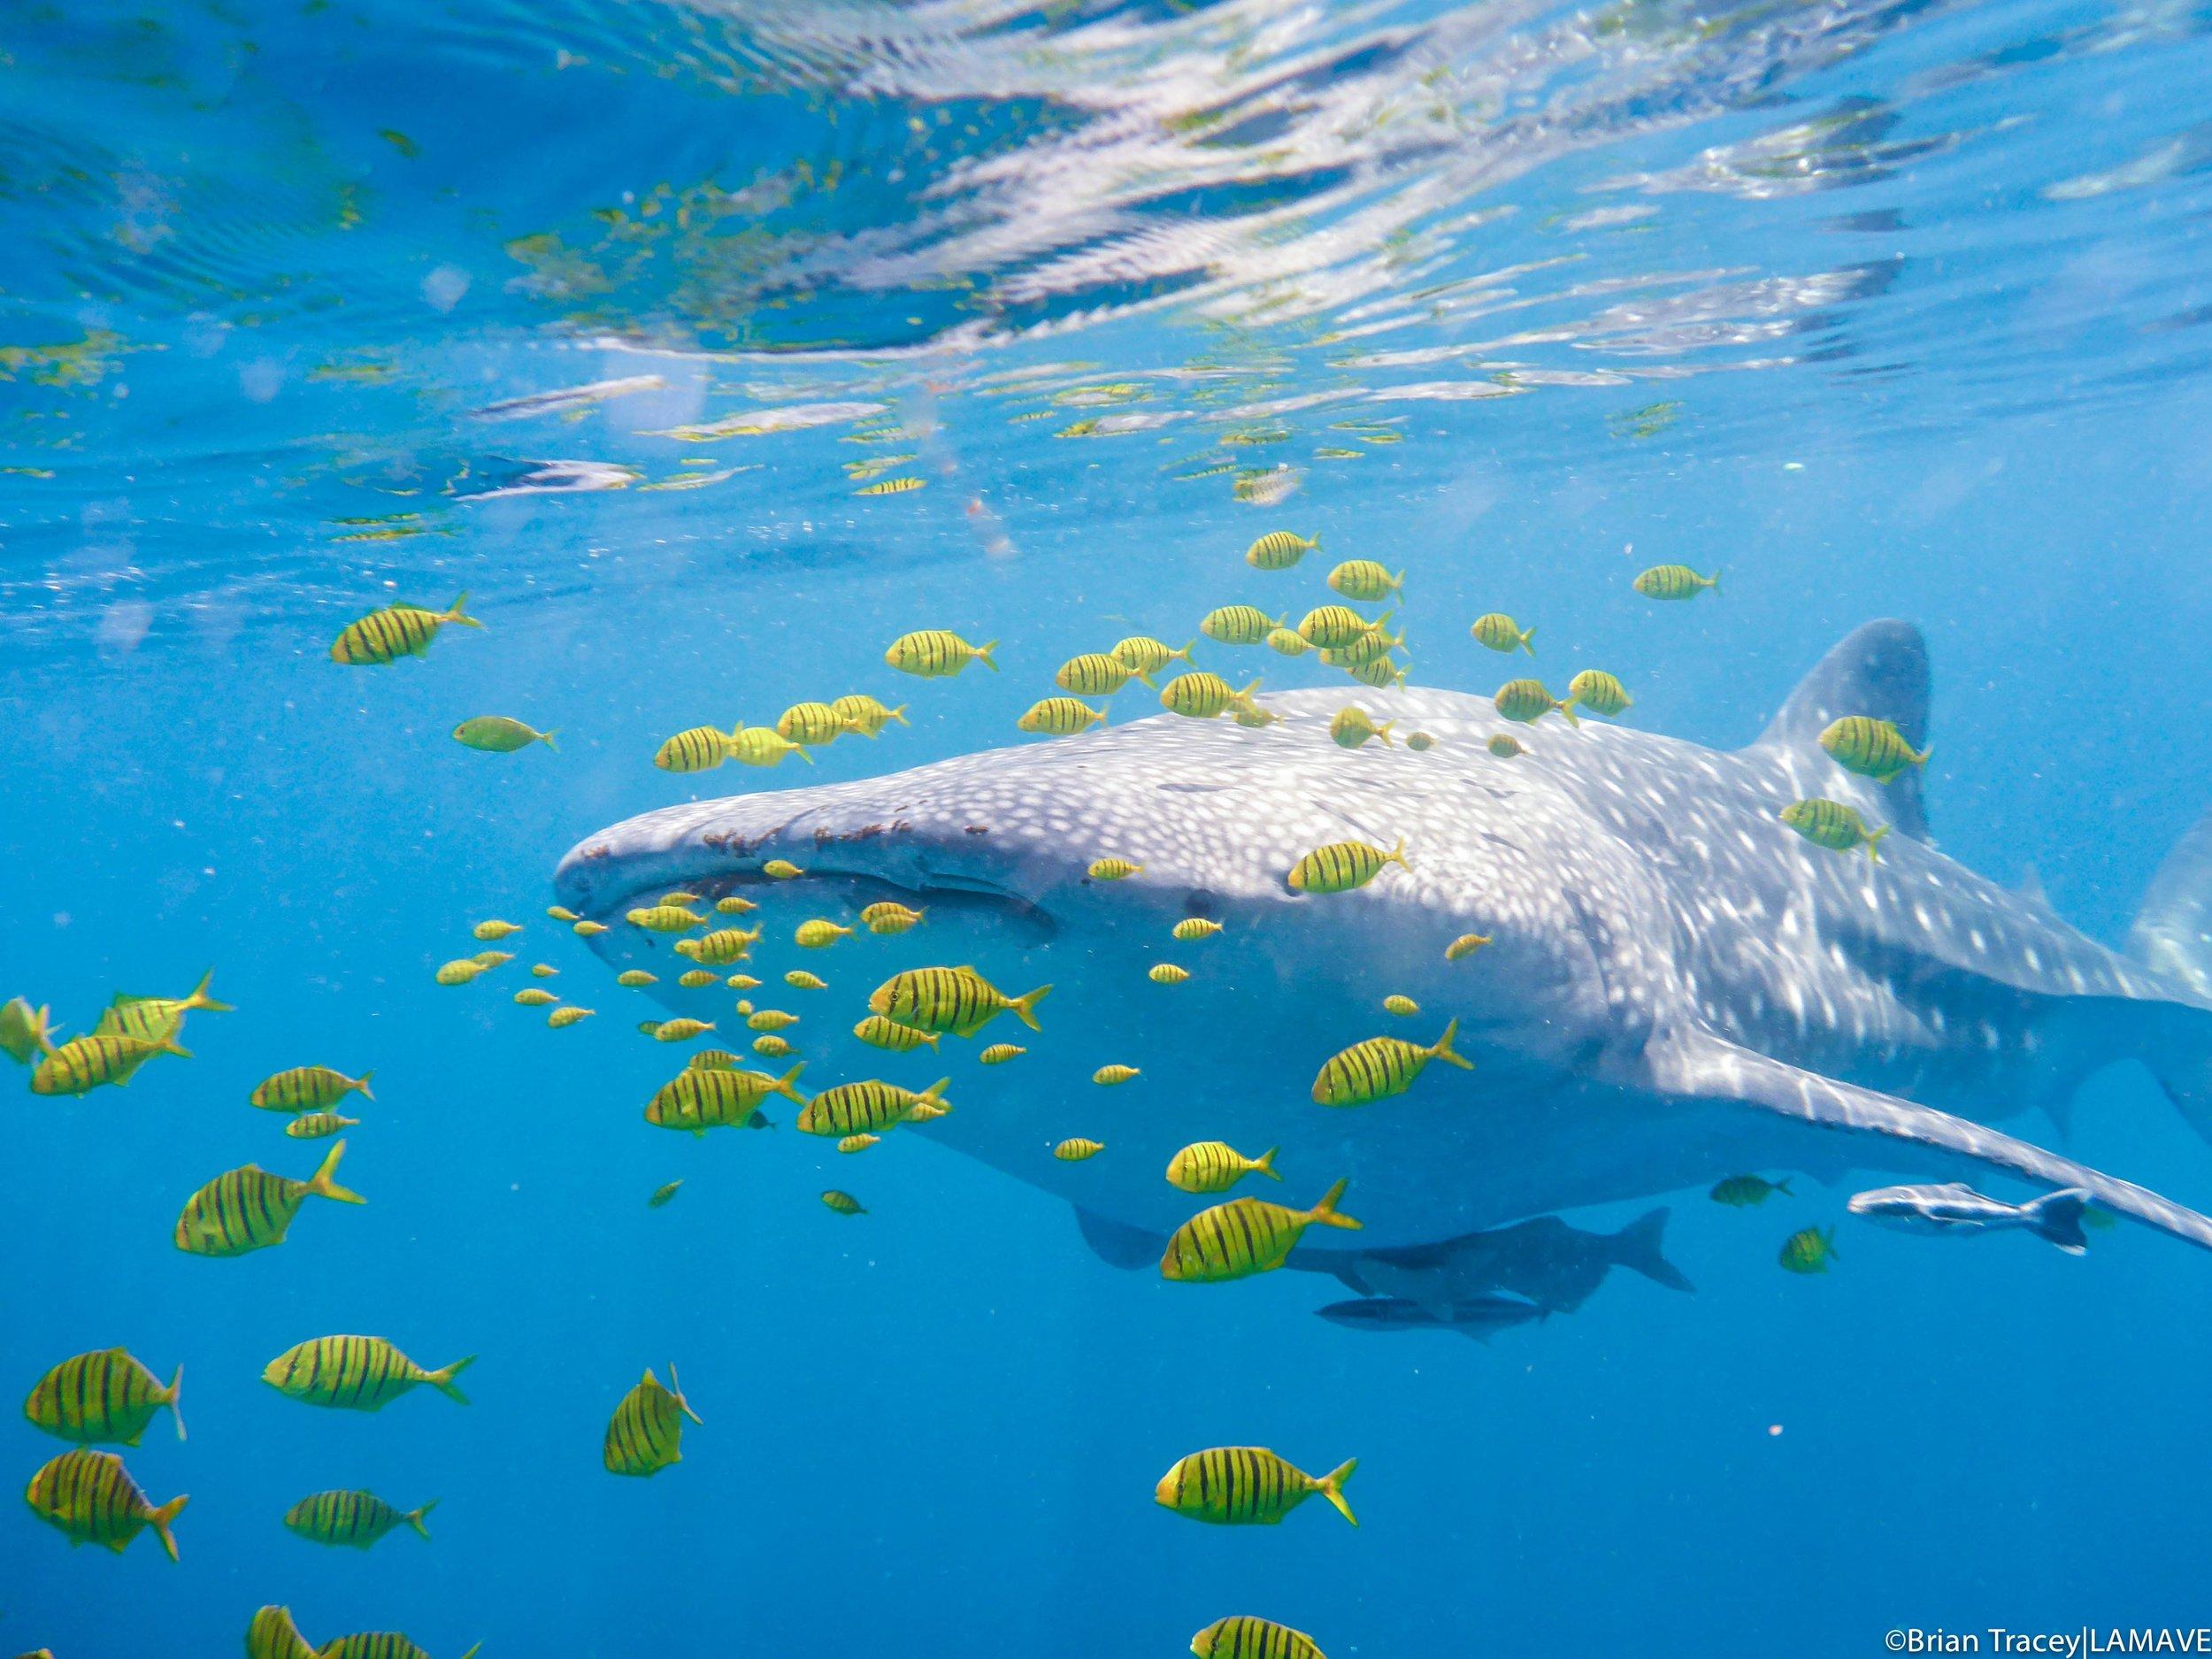 PALAWAN WHALE SHARK PROJECT -